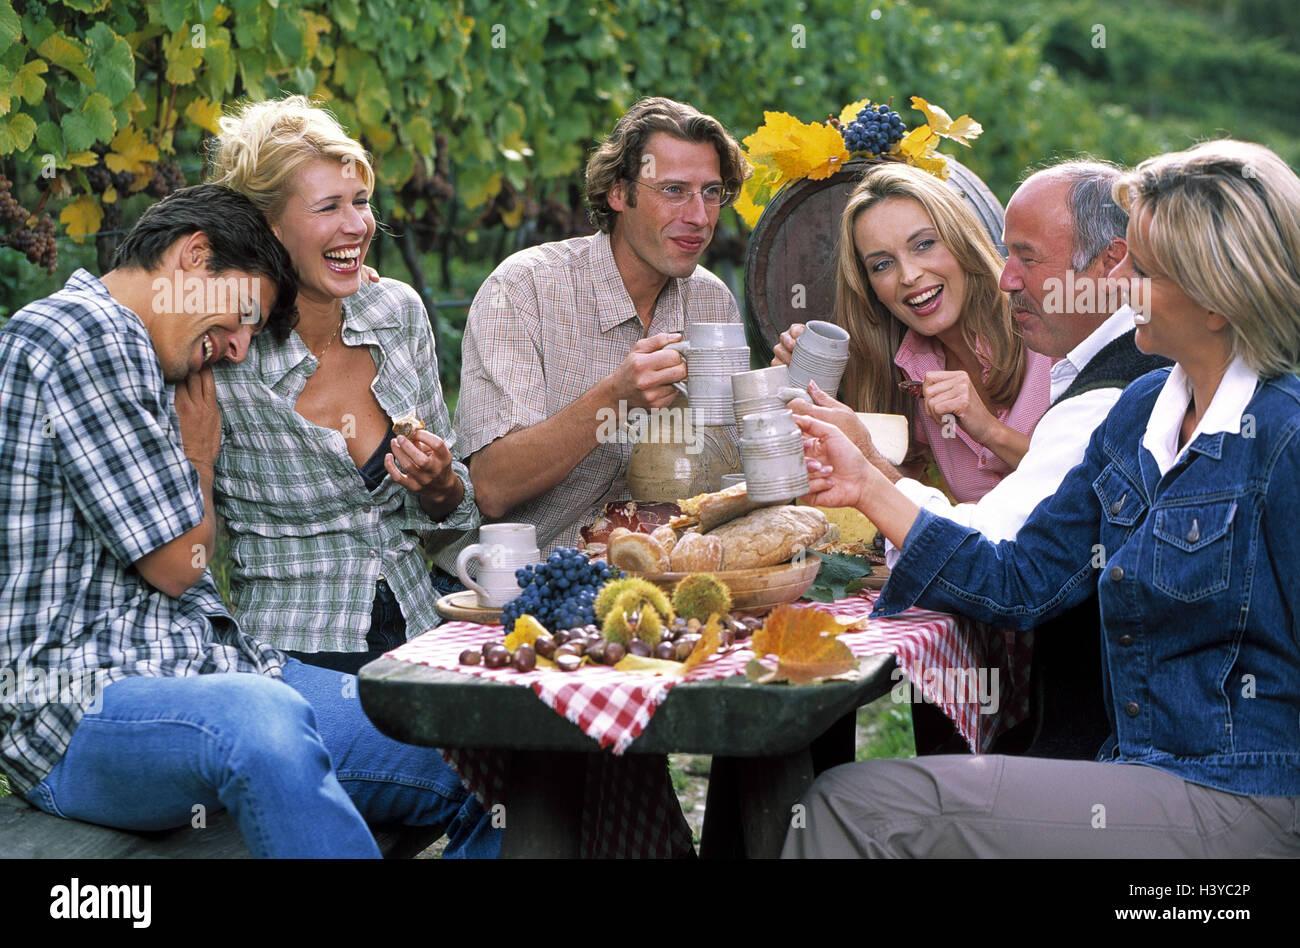 Vineyard, group, men, women, törggelen, outside, lifestyle, clique, table, sit, drink, leisure time, person, - Stock Image